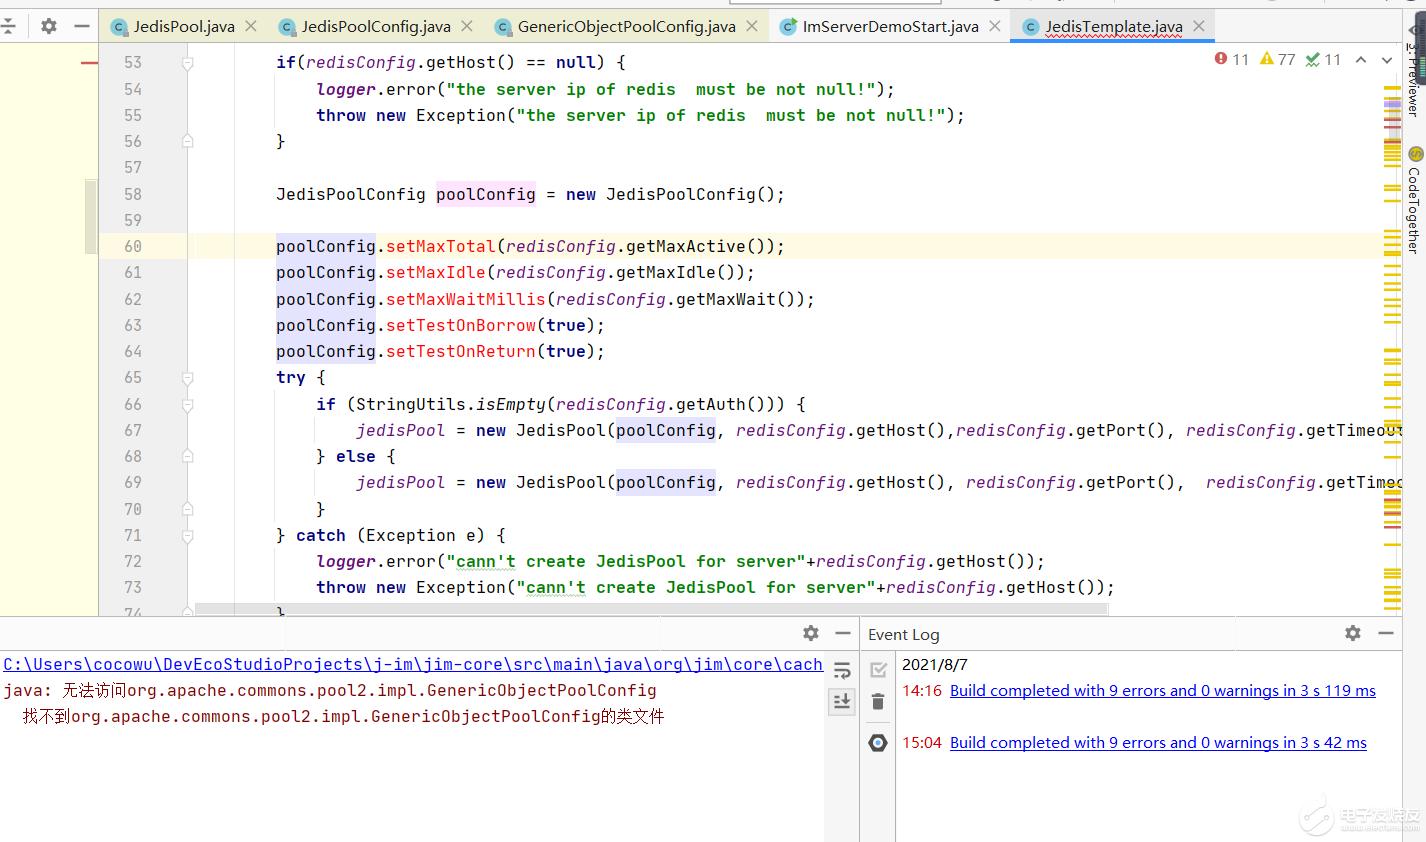 DevEco開發求助:找不到org.apache.commons.pool2.impl.GenericObjectPoolConfig的類文件